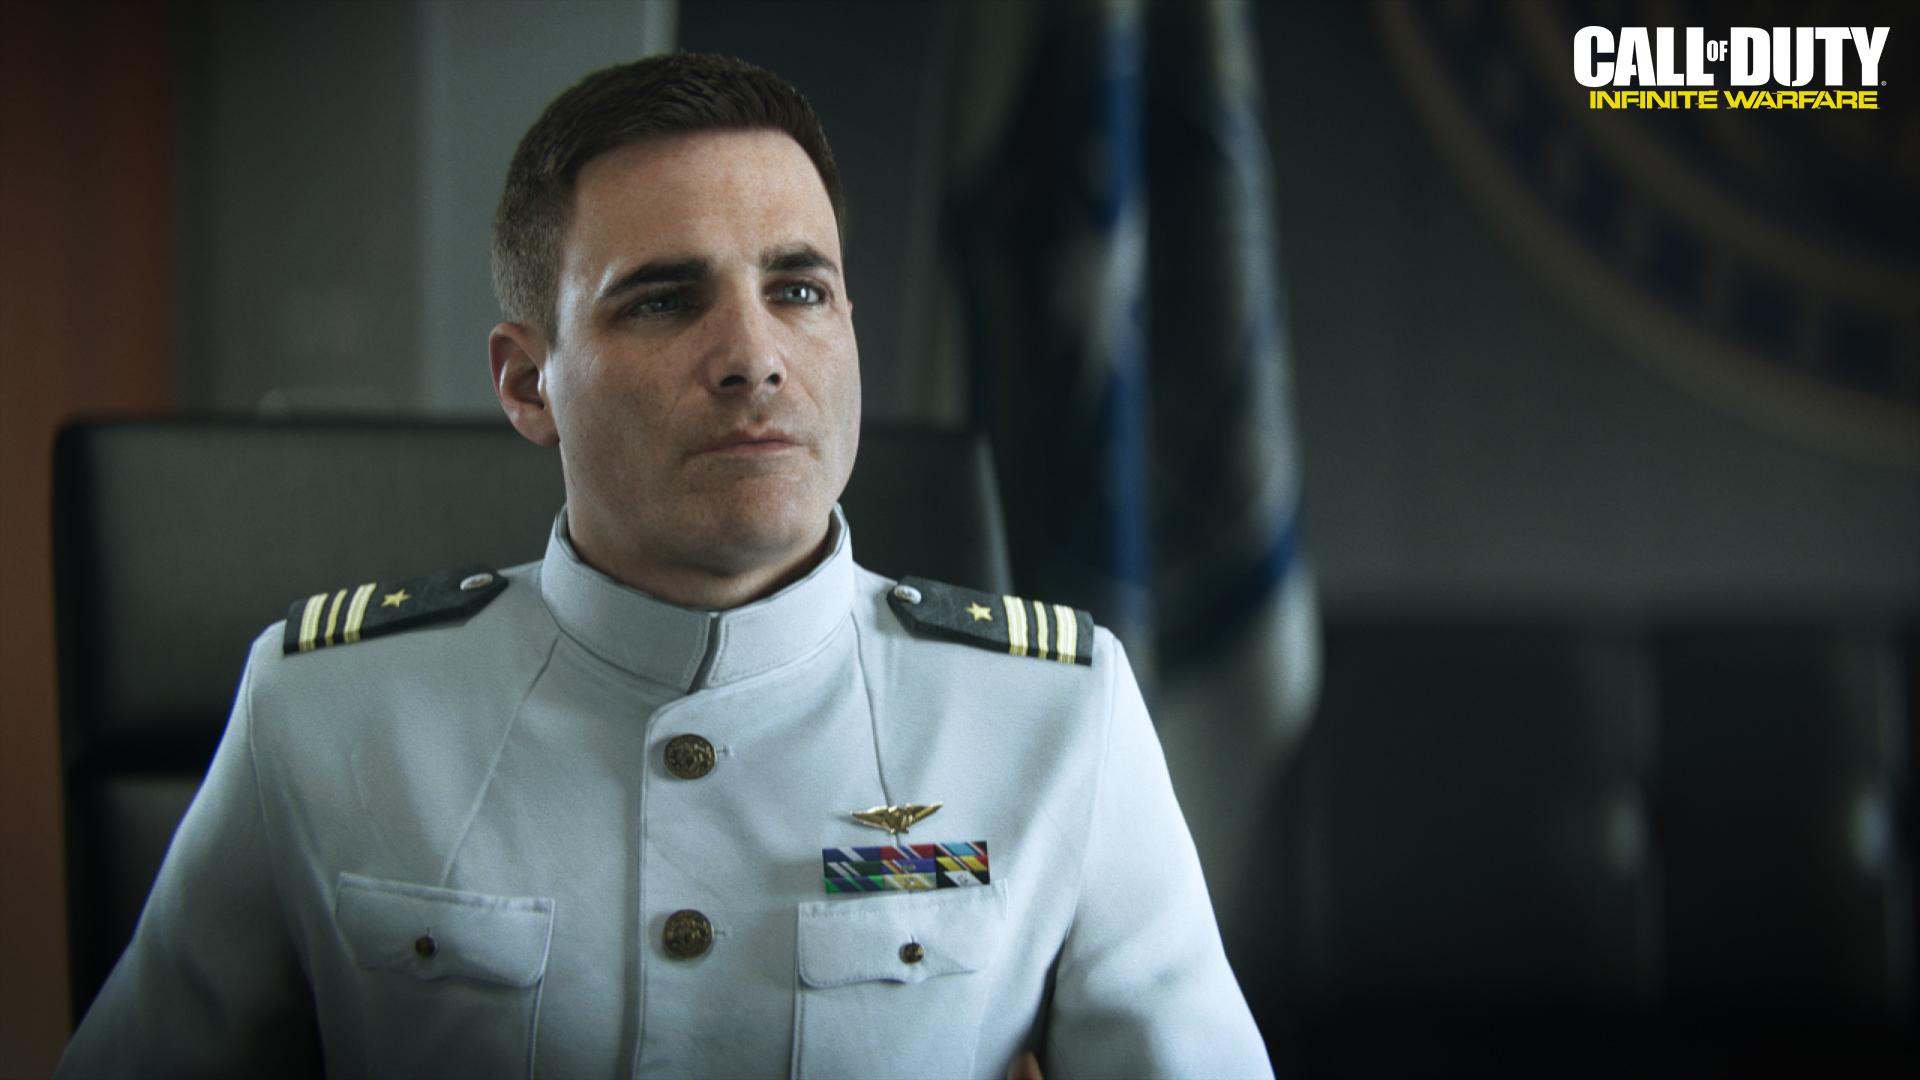 Call Of Duty: Infinite Warfare - unlikely to break Activision's winning streak